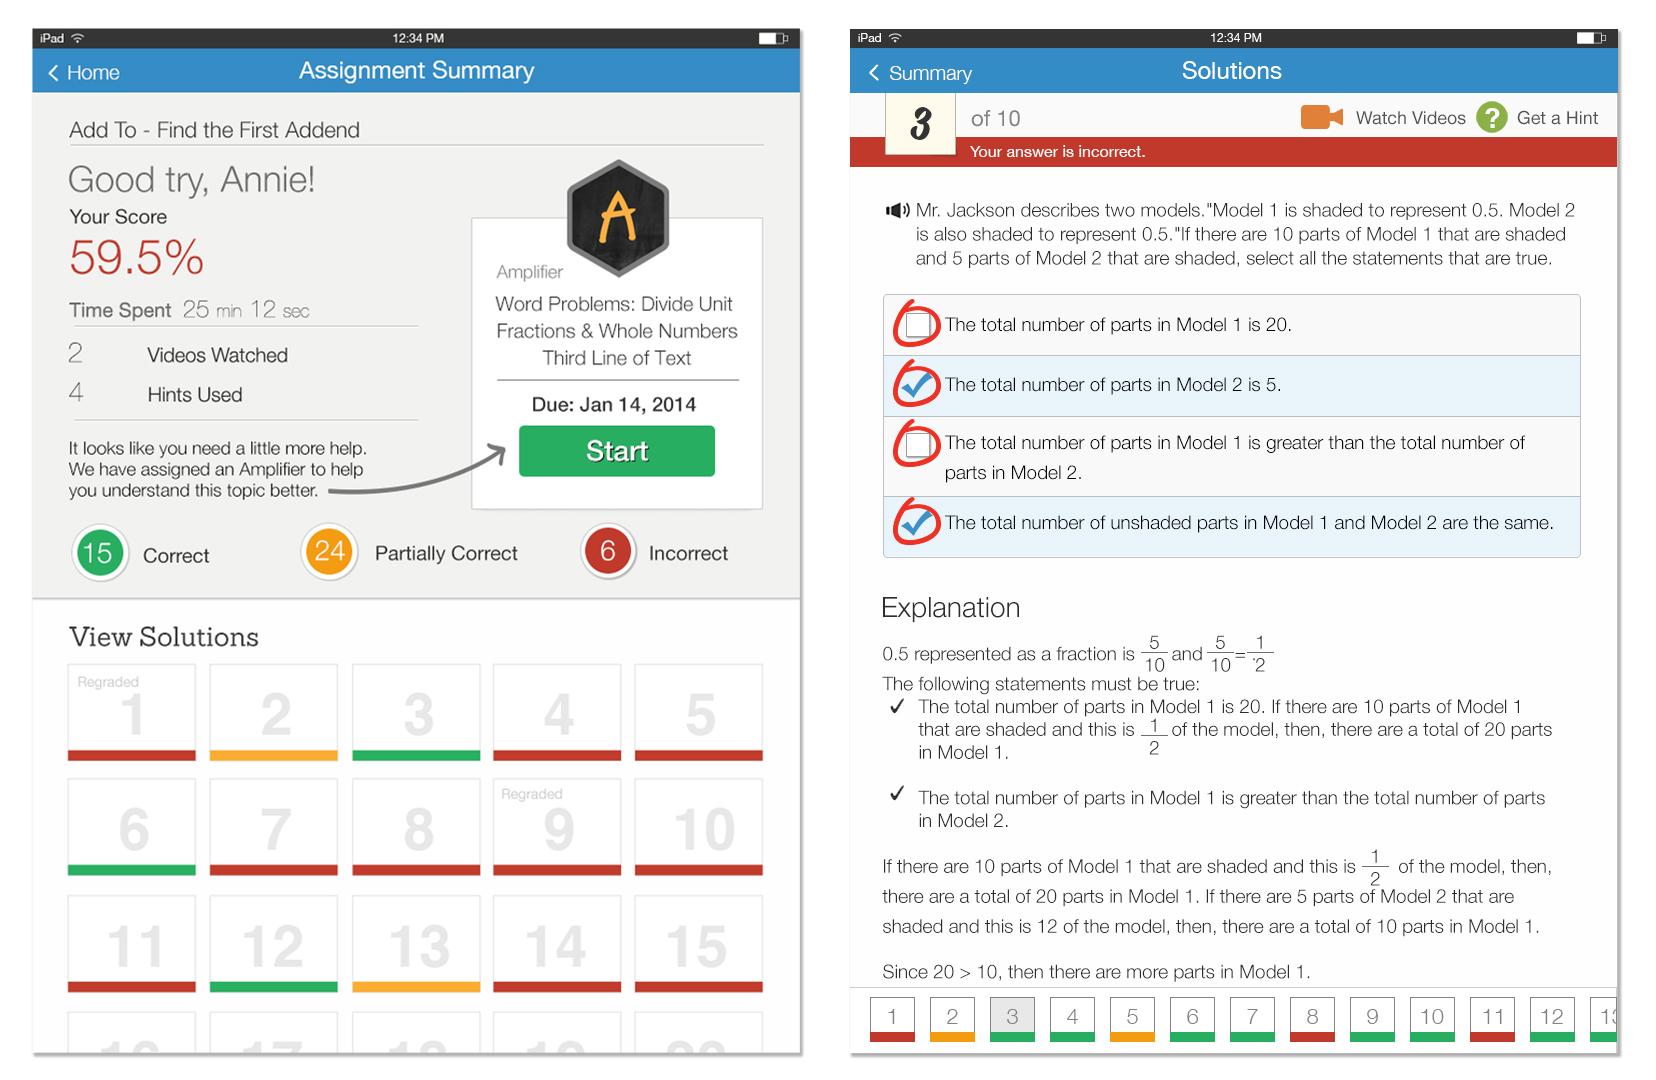 Solutions_AssignmentSummary.jpg